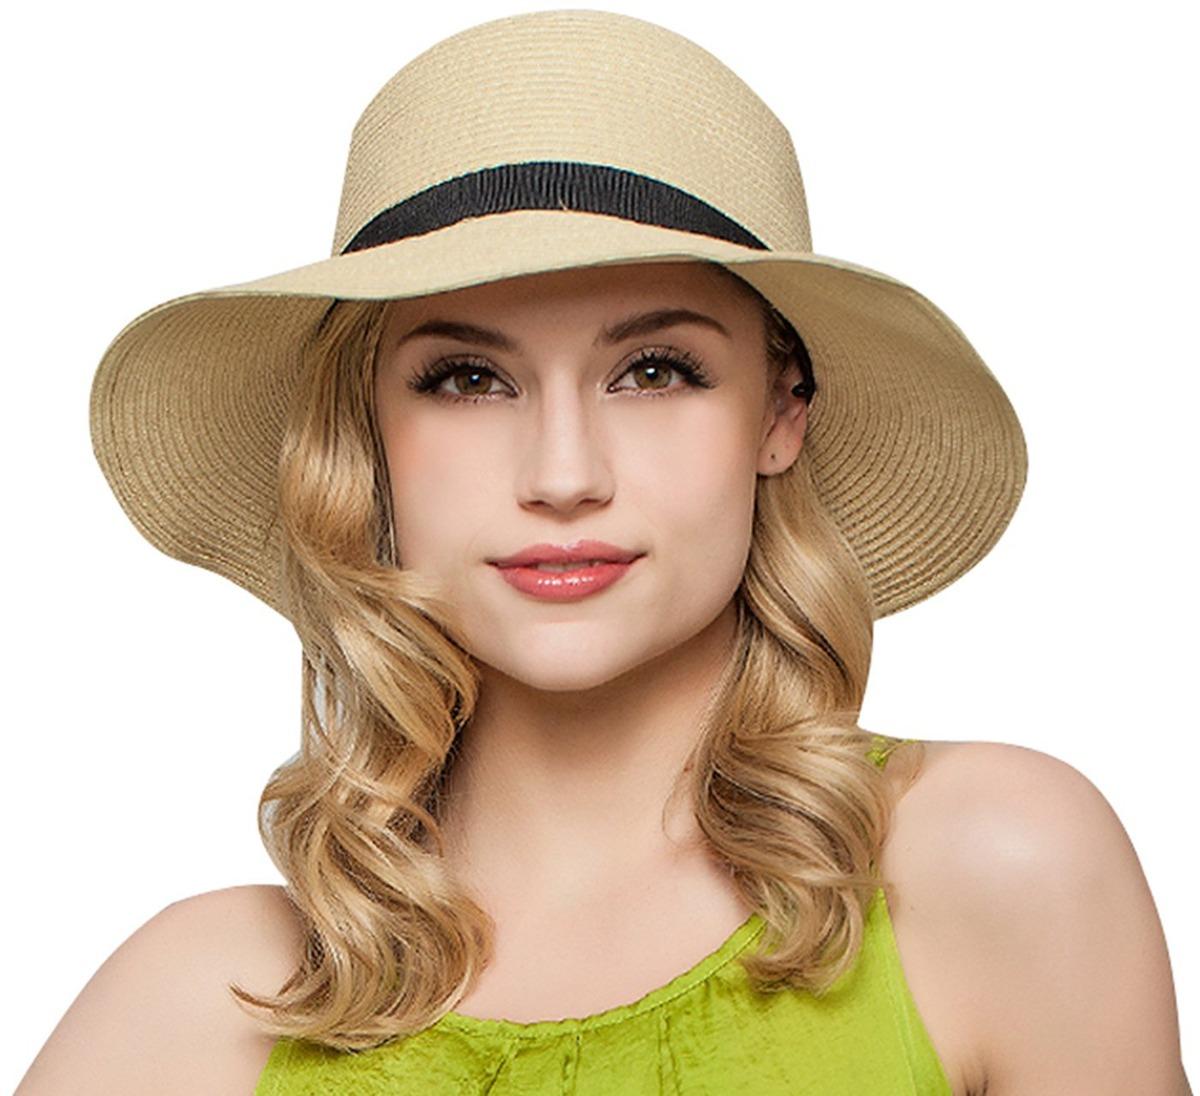 Gorros De Playa Floppy Sun Beach Sombreros Gorra De Veran - U S 49 ... 308217cfa0ea